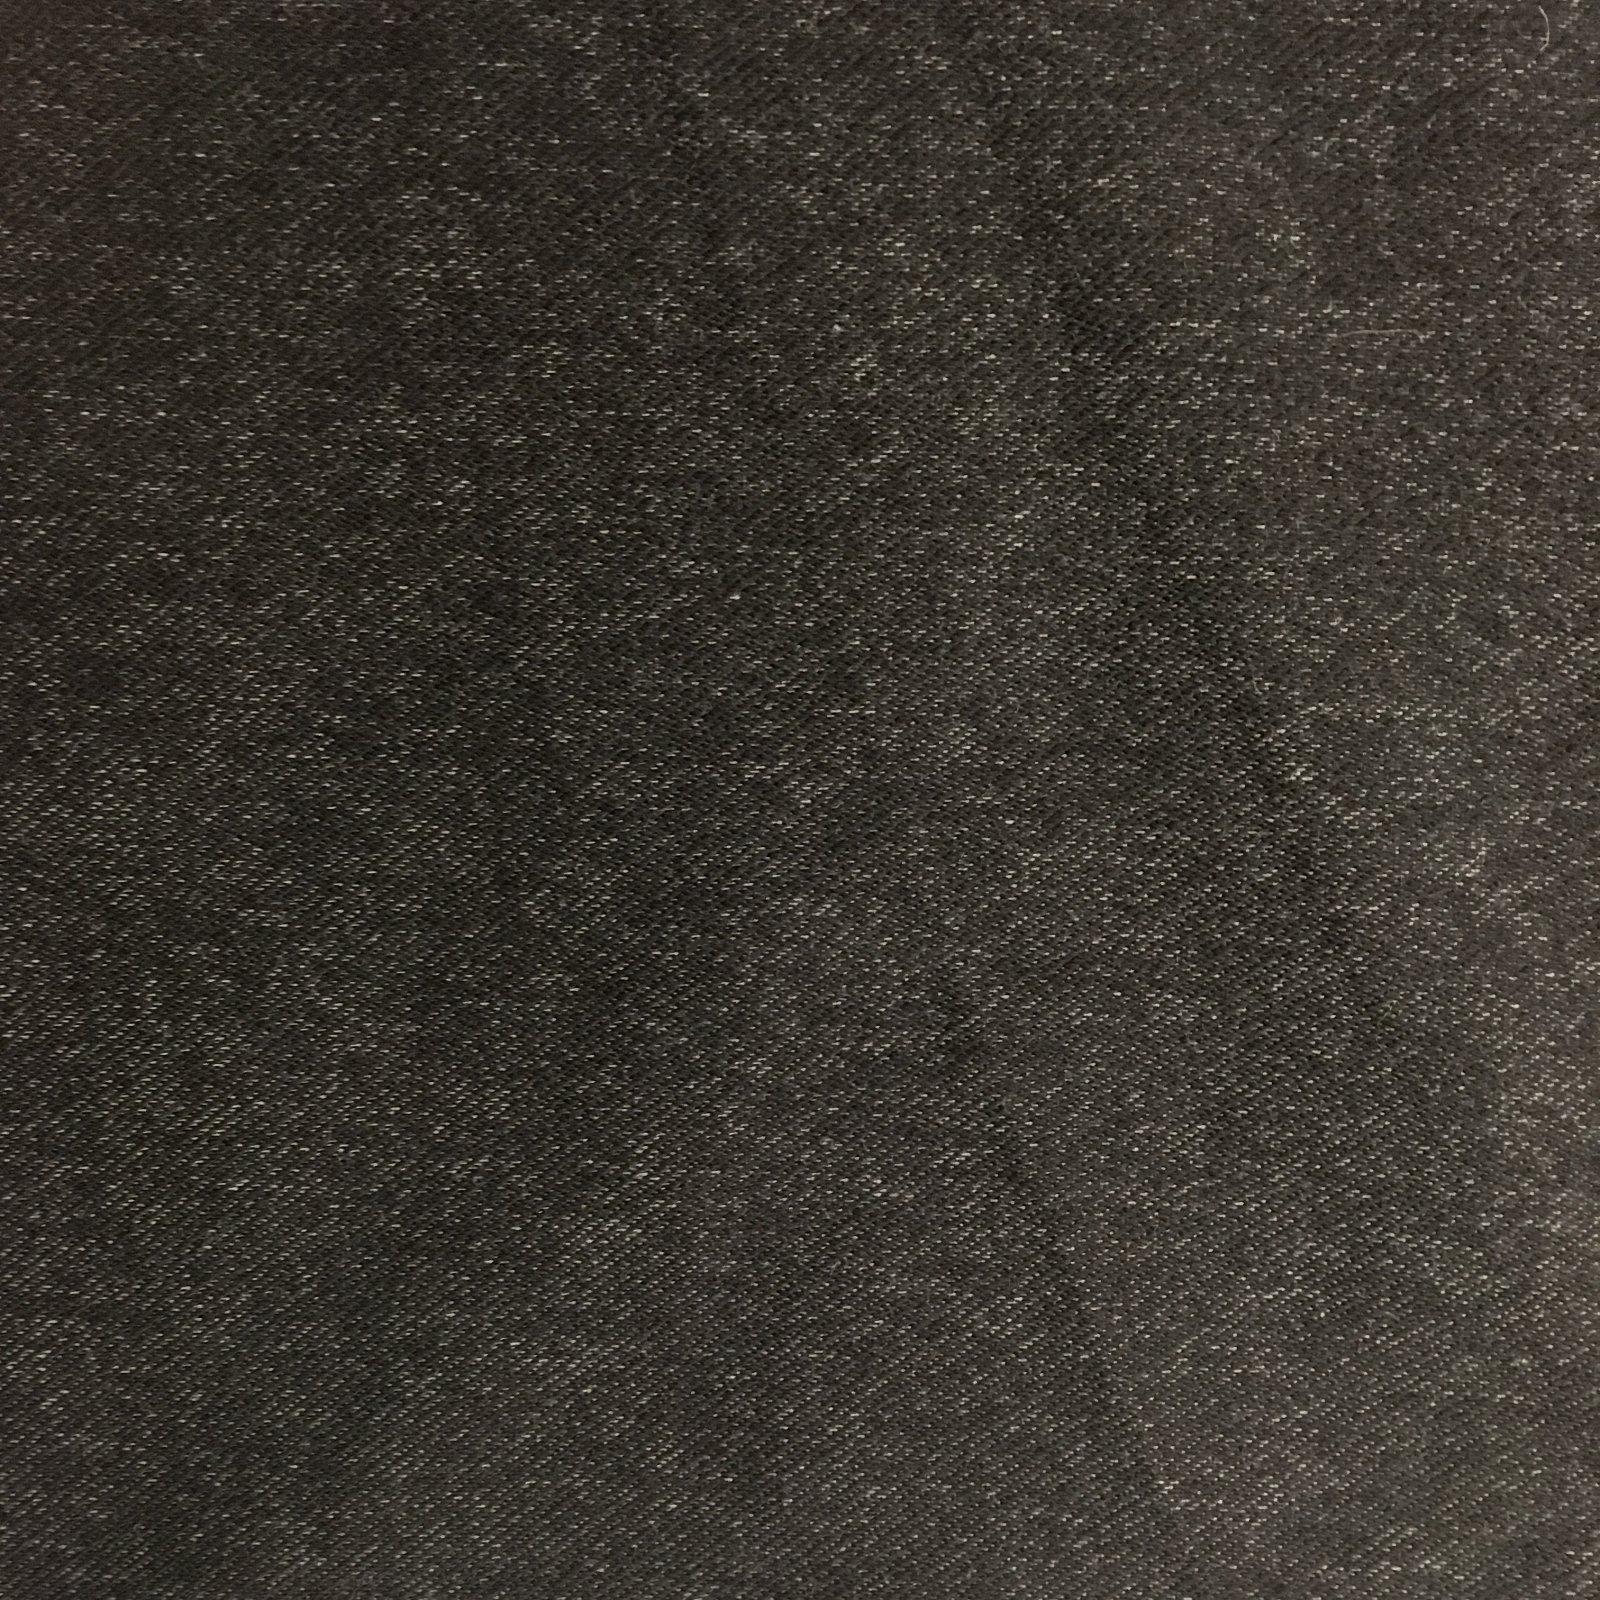 12oz Organic Cotton Denim Knit - Black